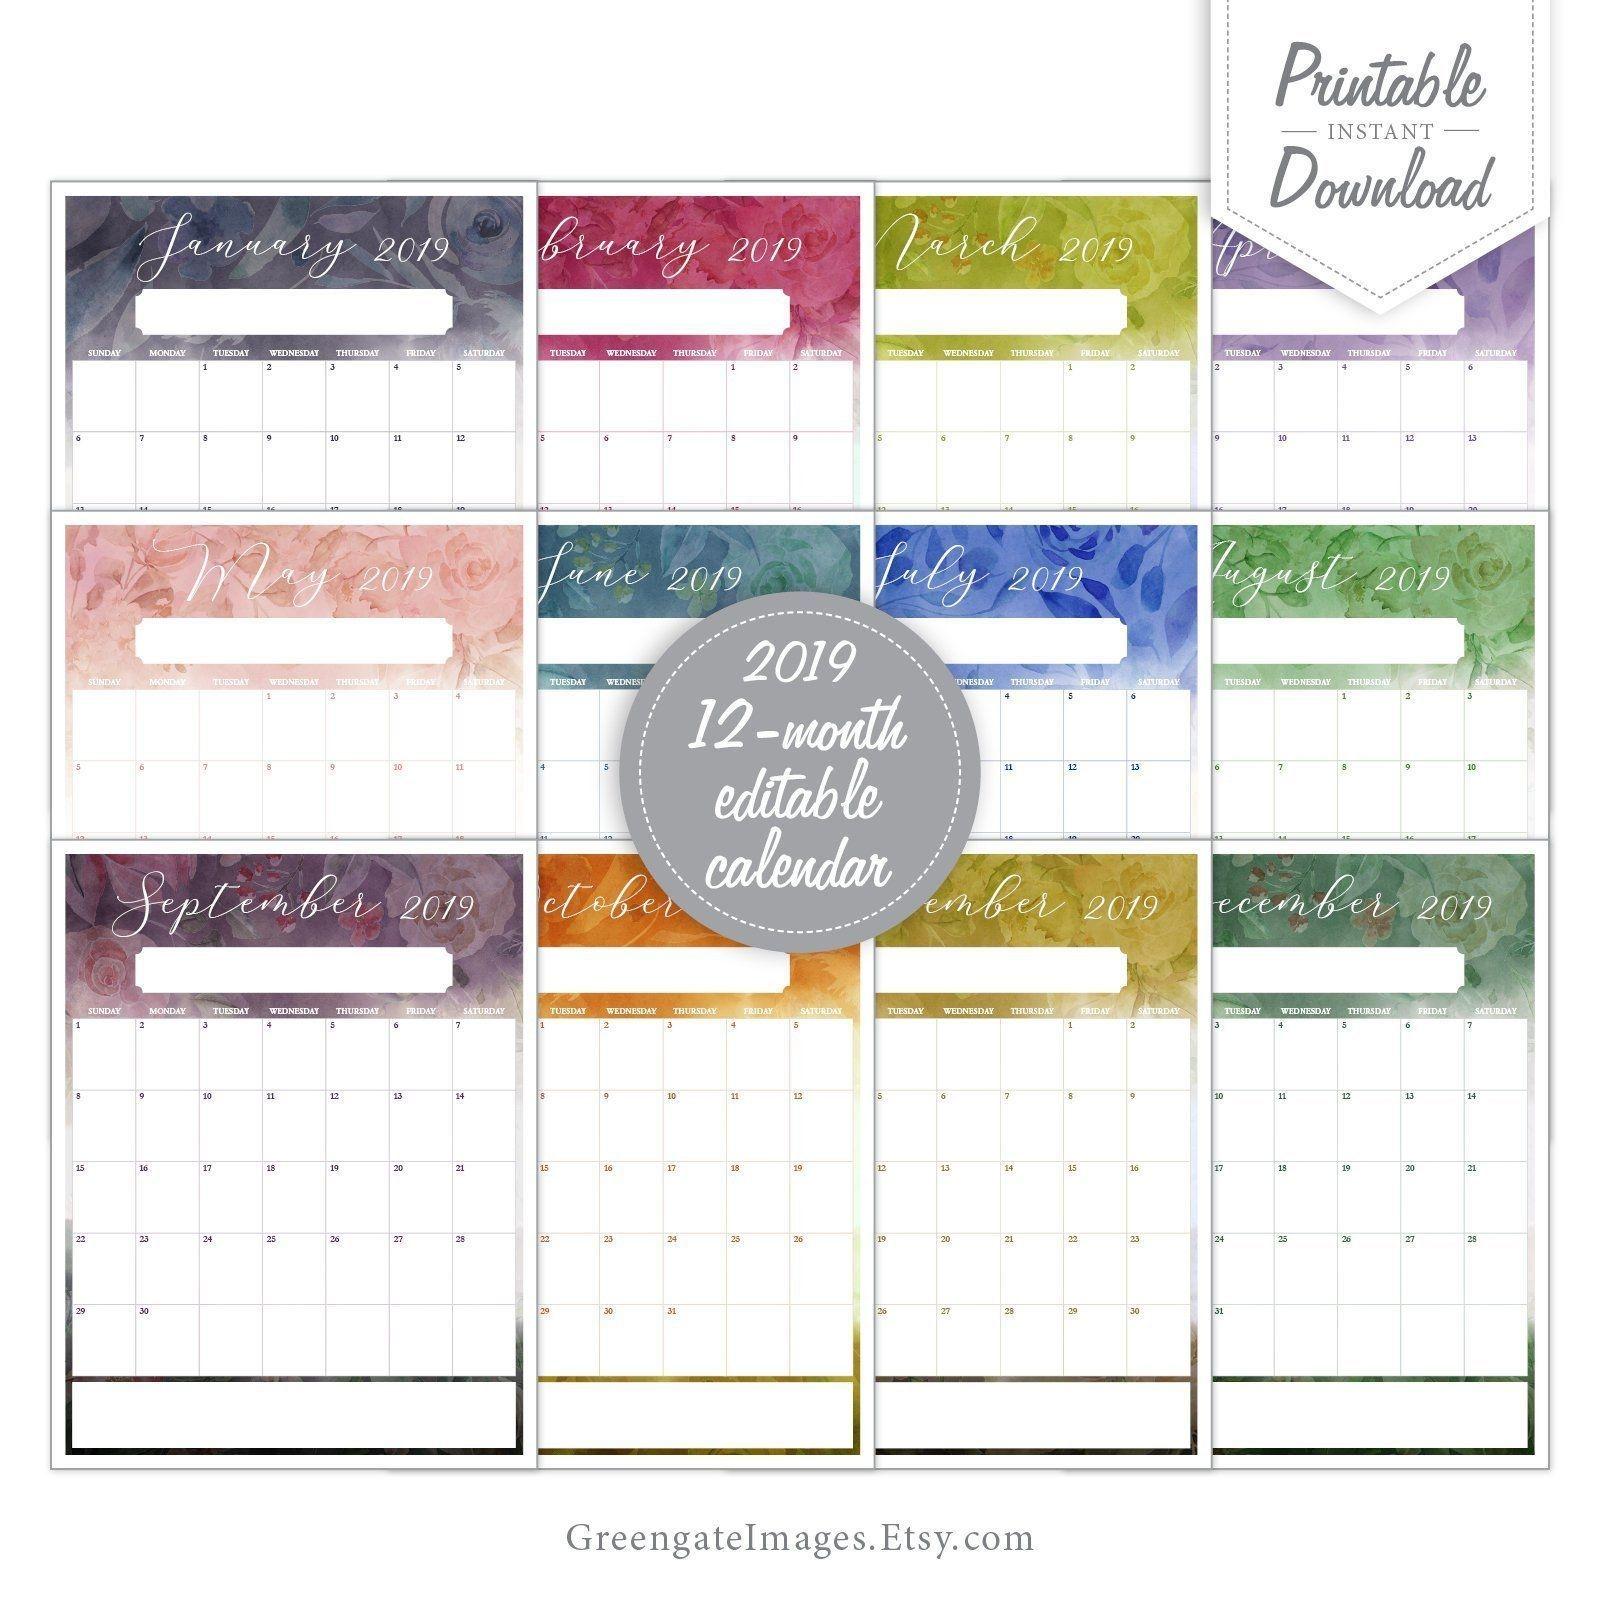 2019 Editable Calendar - Fillable Calendar, 12 Month